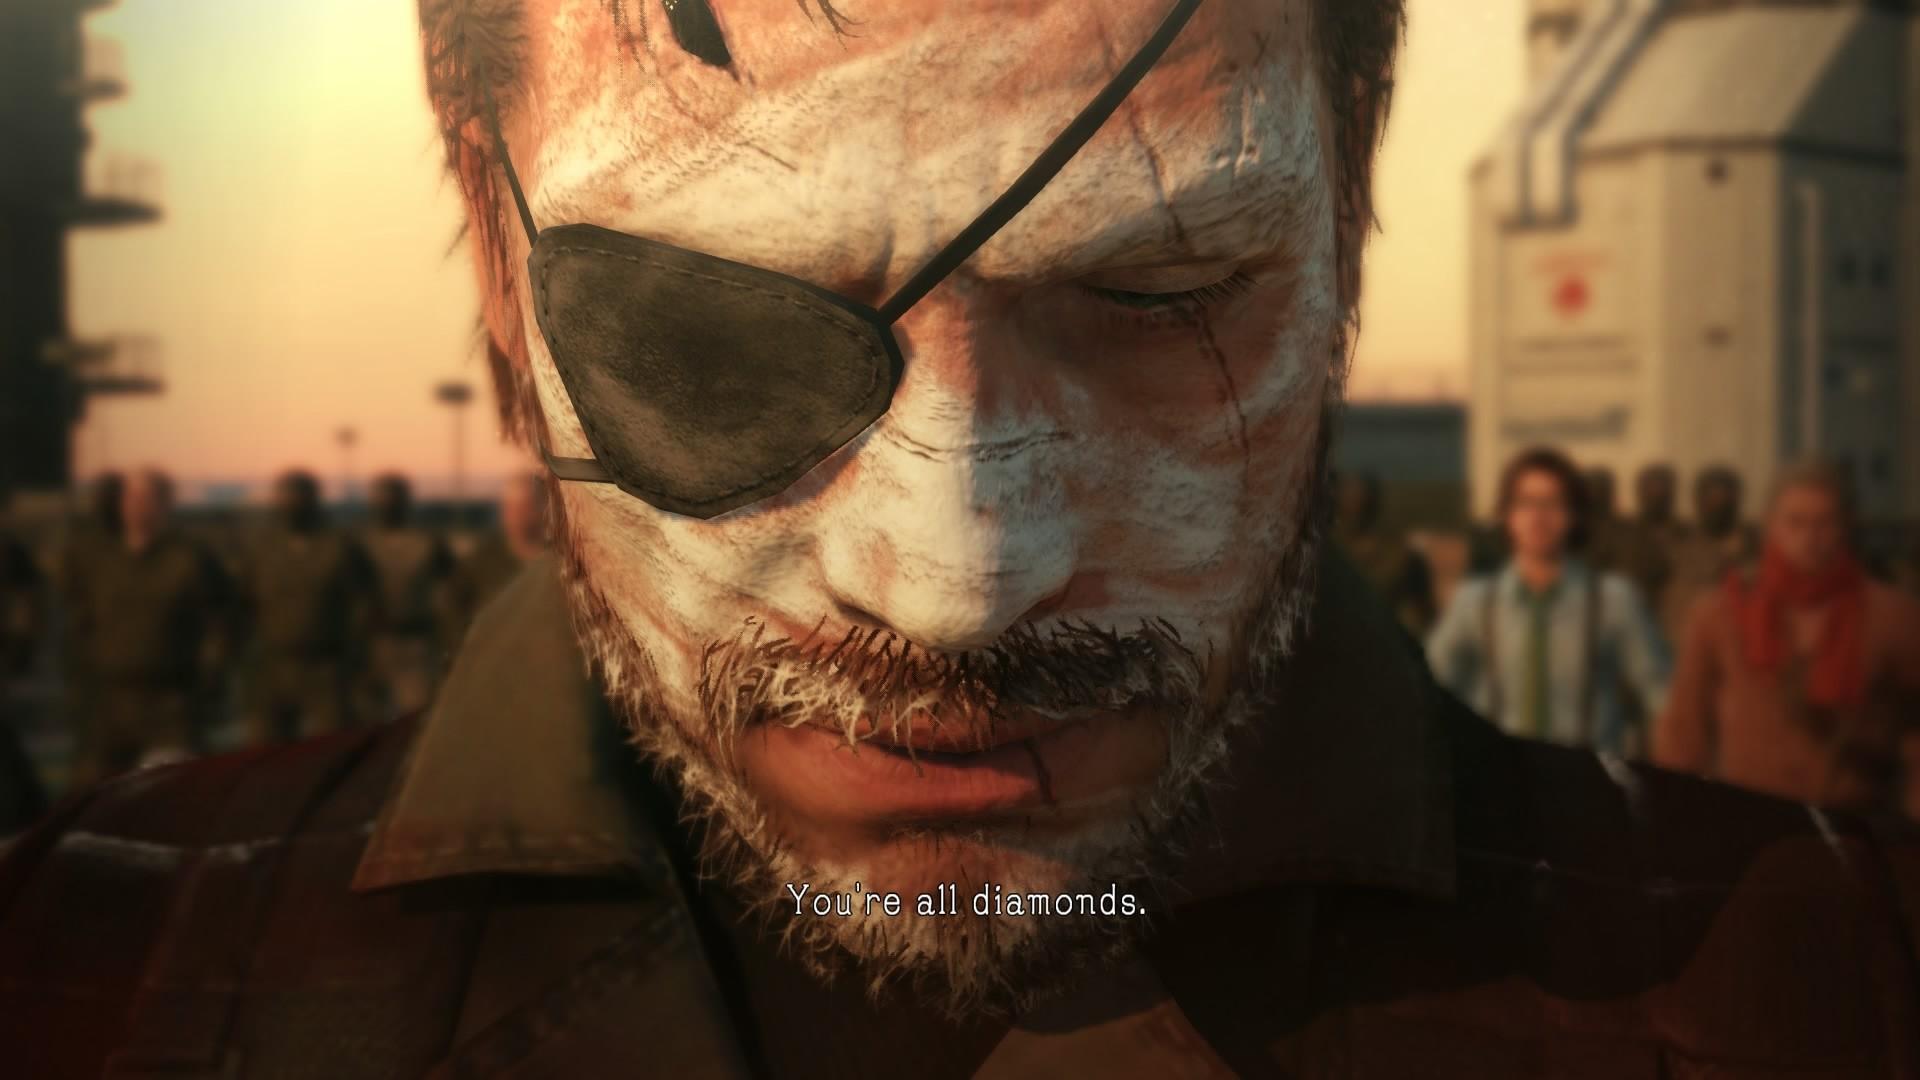 Wallpaper 1920x1080 Px Big Boss Metal Gear Solid V The